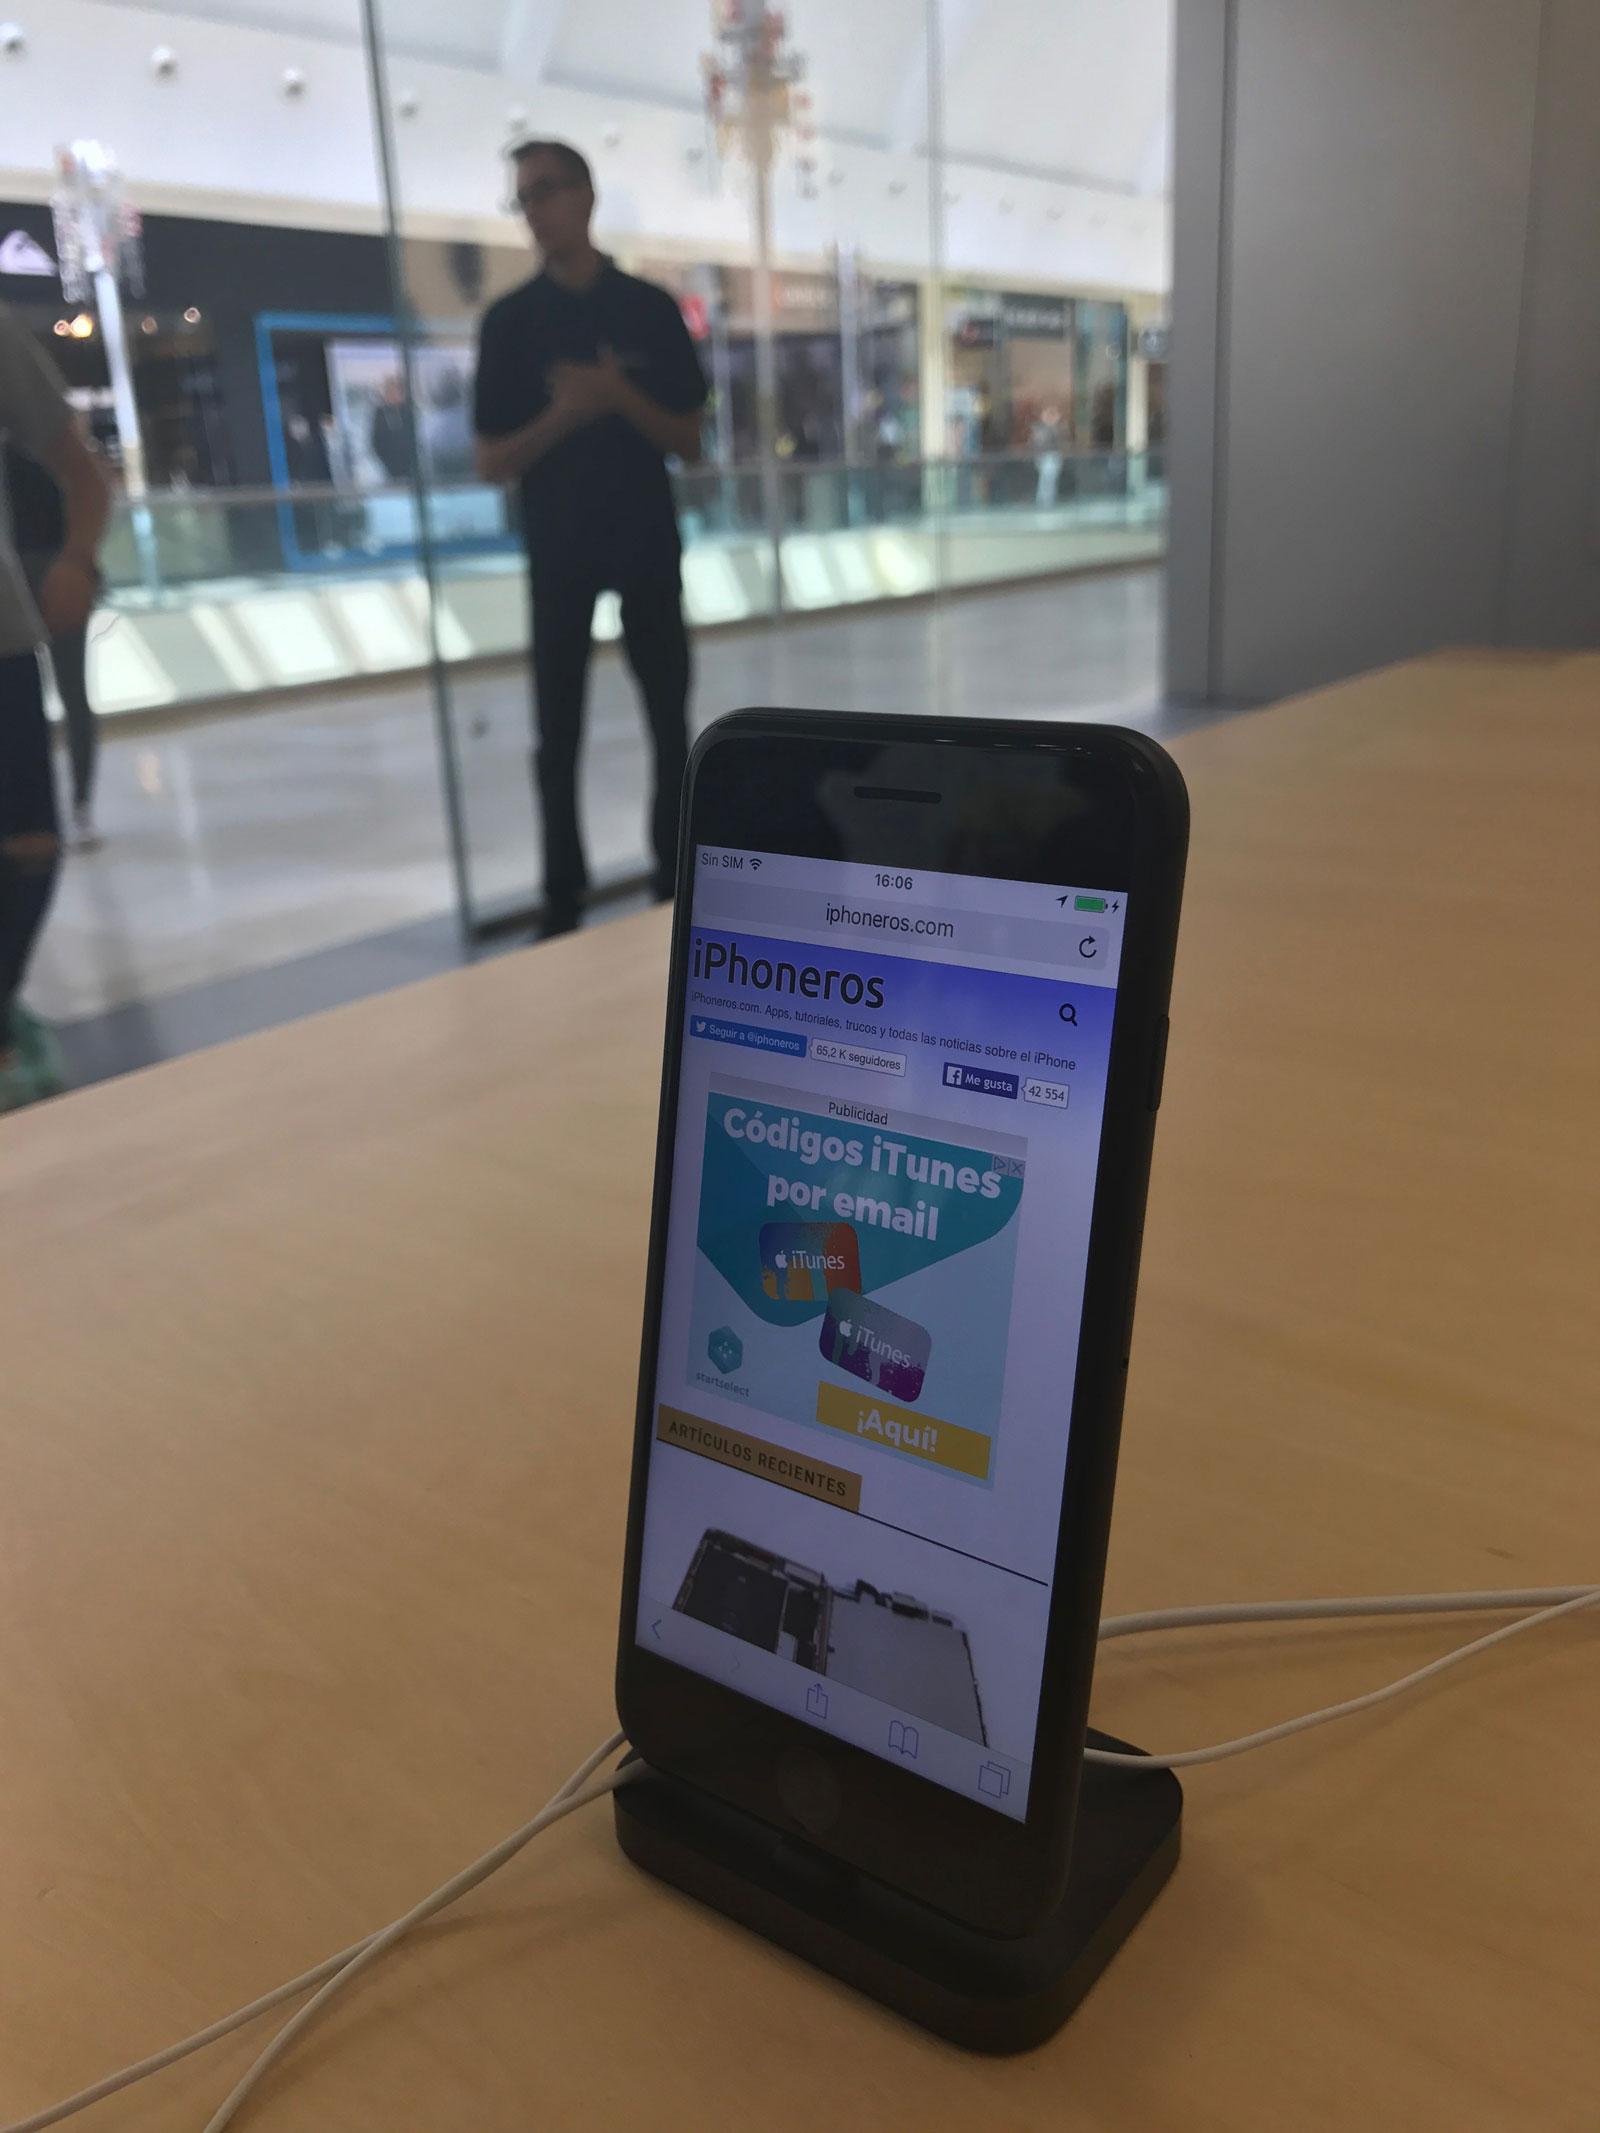 iPhone siete con iPhoneros cargada en alguna Apple™ Store